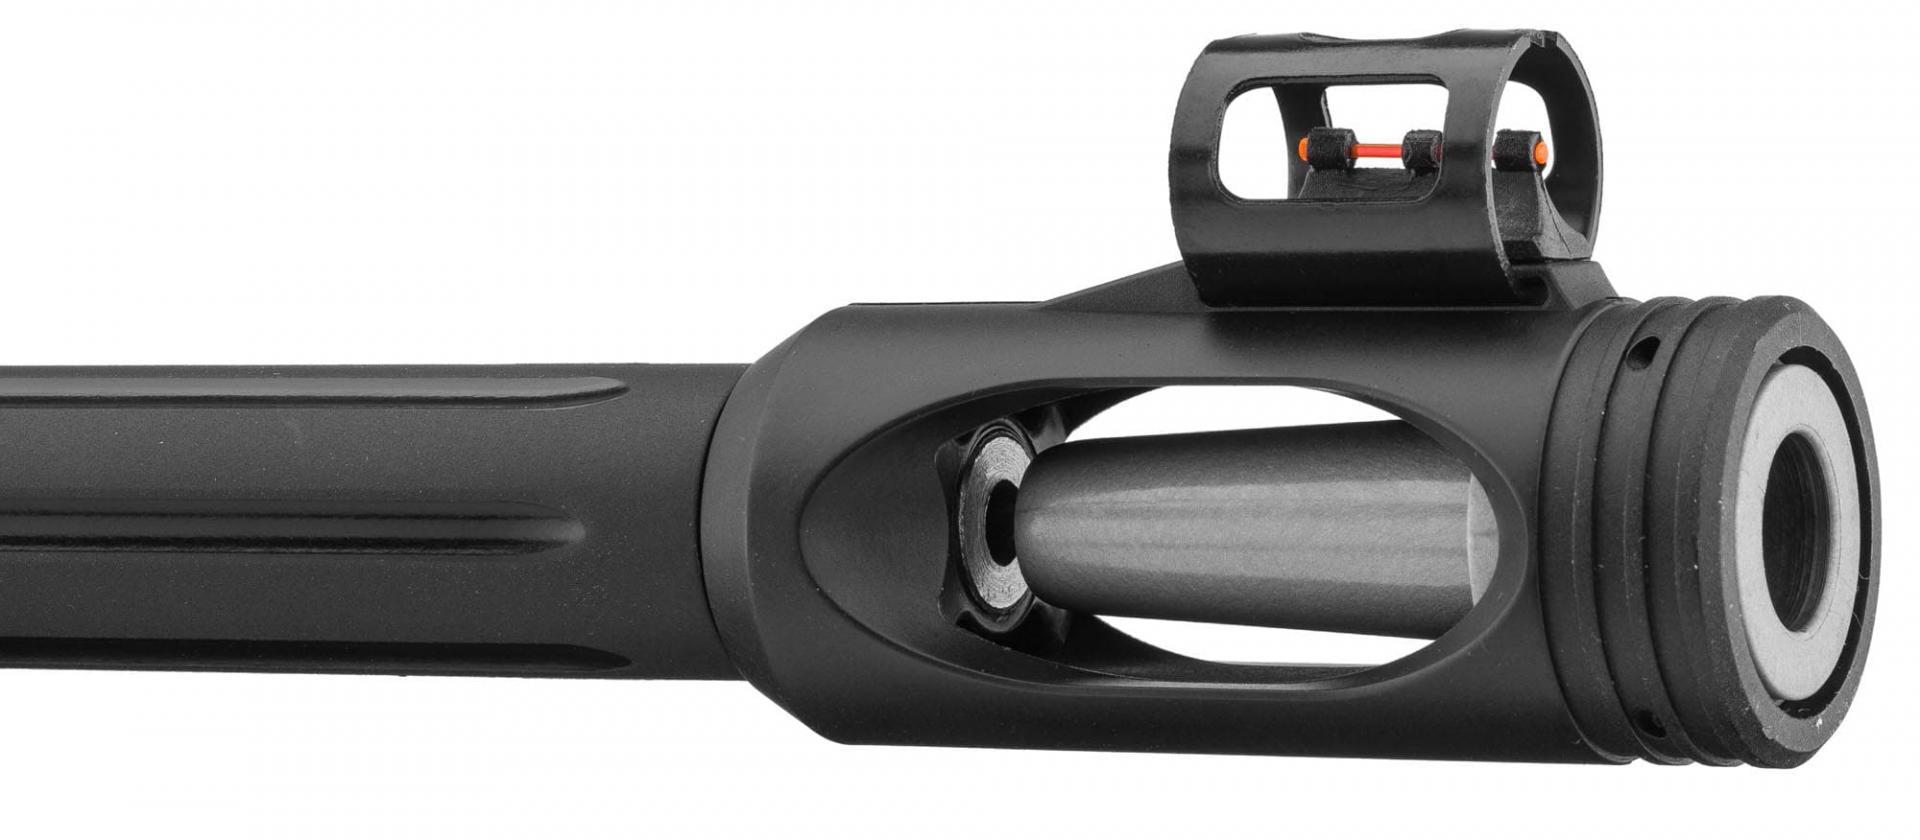 Carabine GAMO Hunter 440 AS + lunette 3-9 x 40 WR